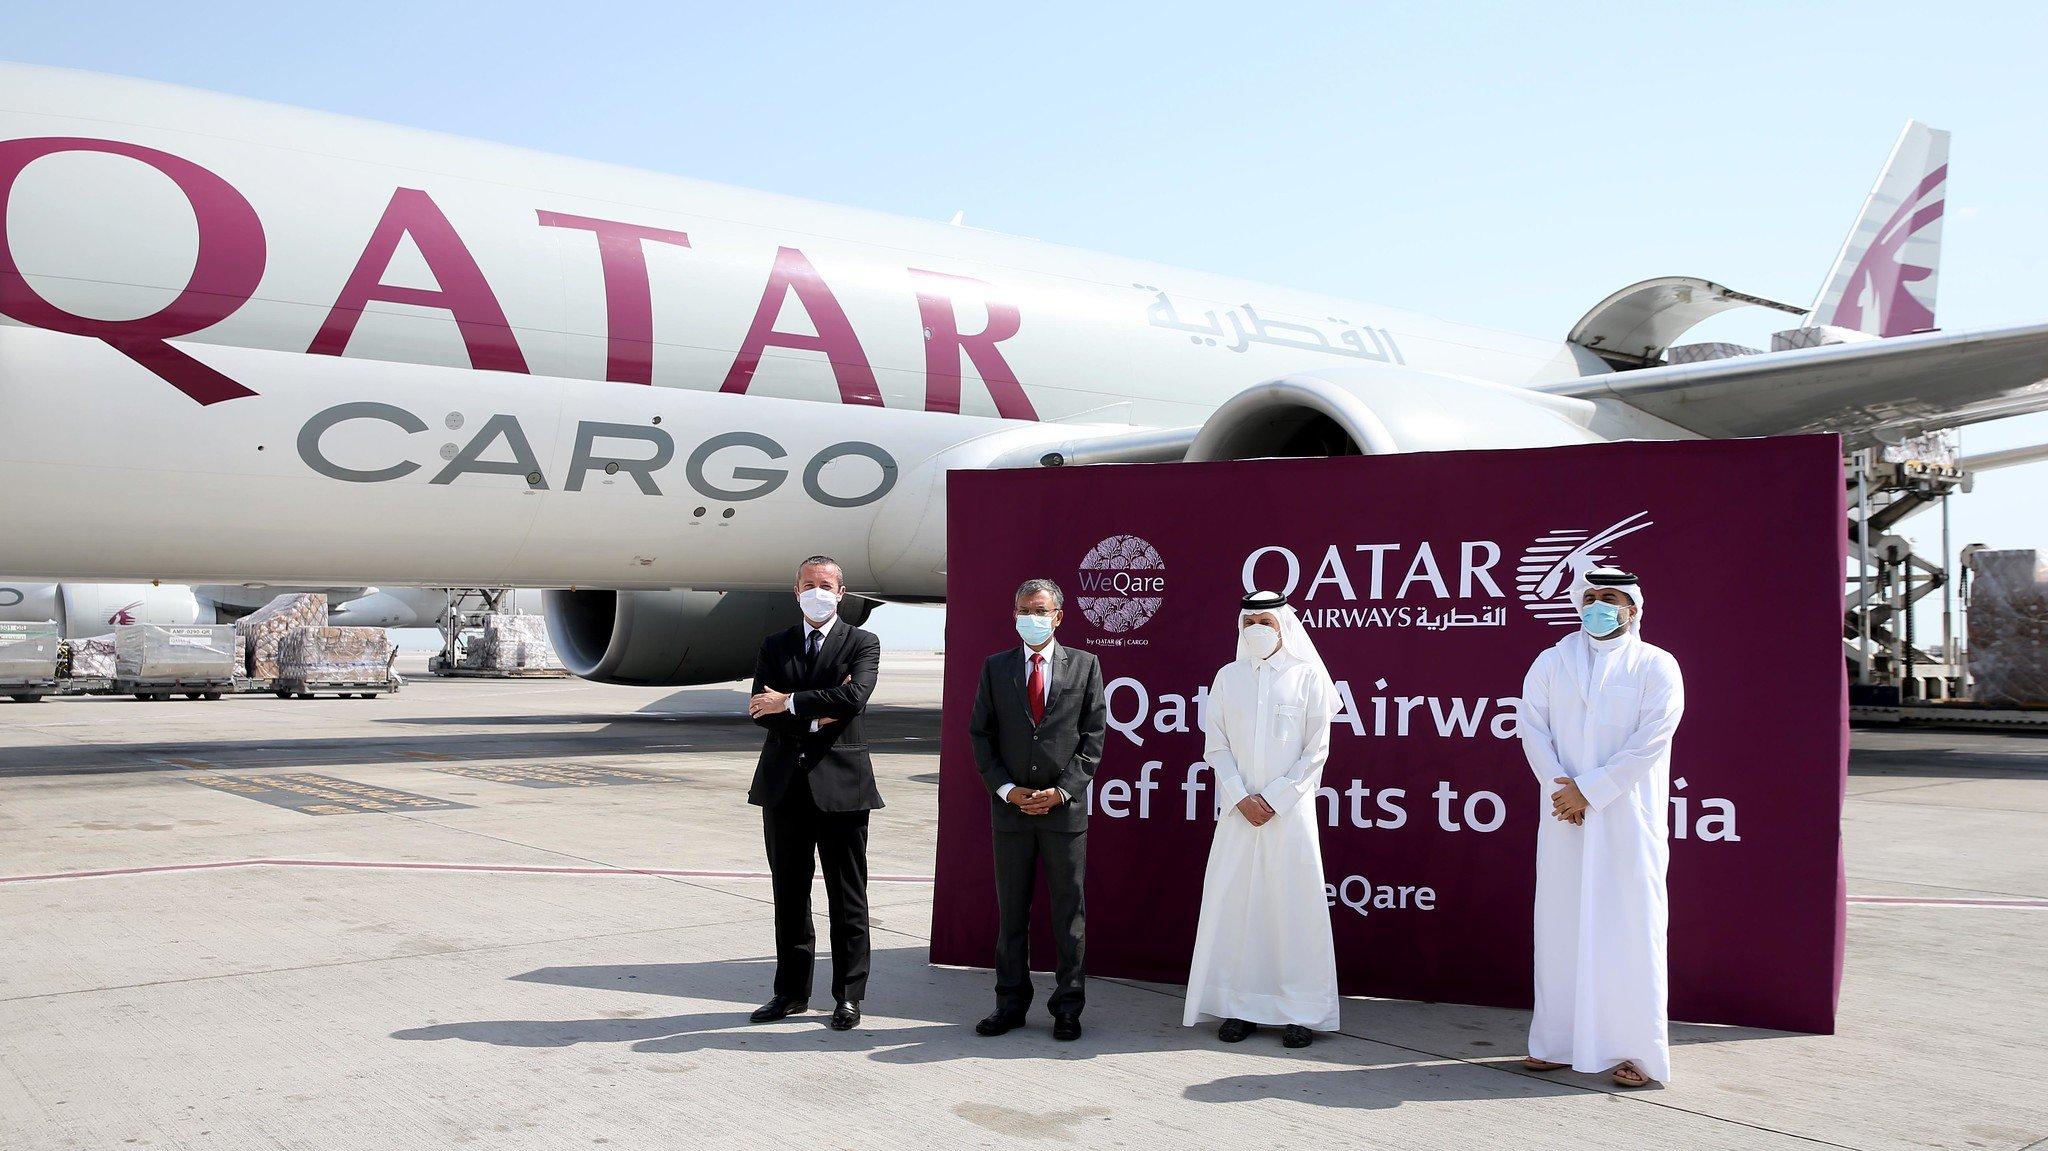 Qatar Airways Cargo Hindistan'a Tıbbi Yardım Paketi Taşıyor